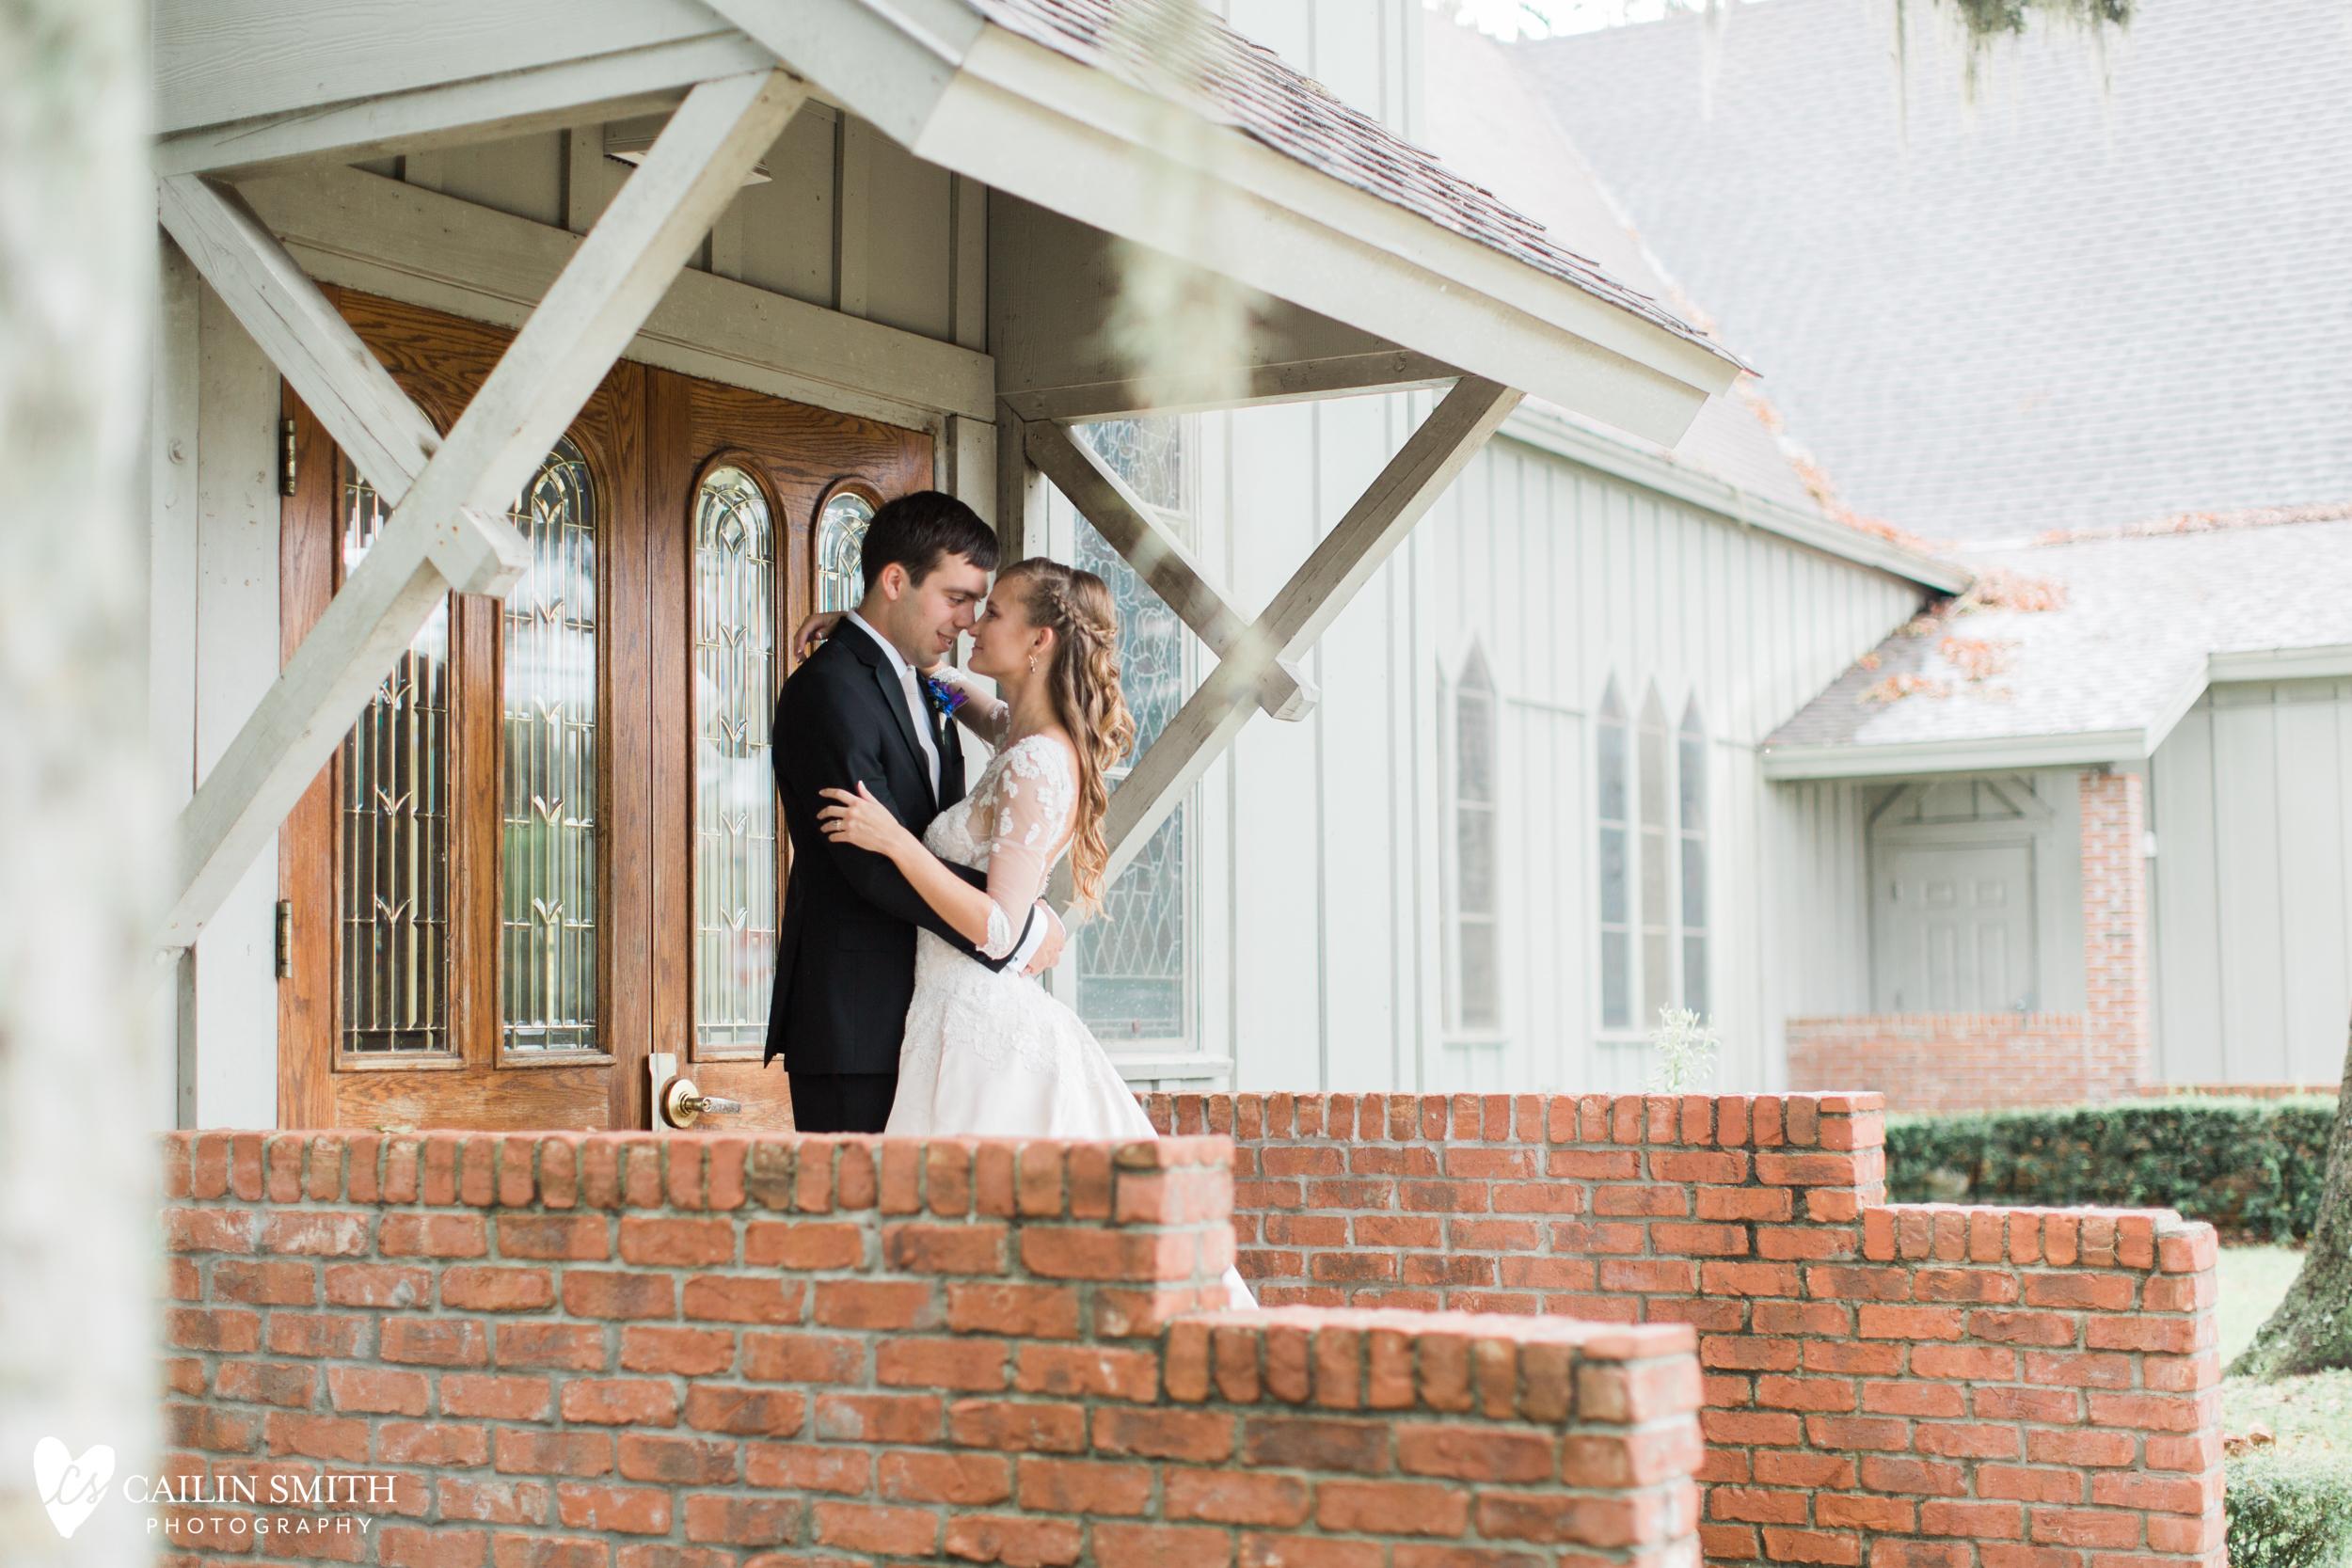 Shannon_David_Grace_Episcopal_Church_Wedding_photography_002.jpg